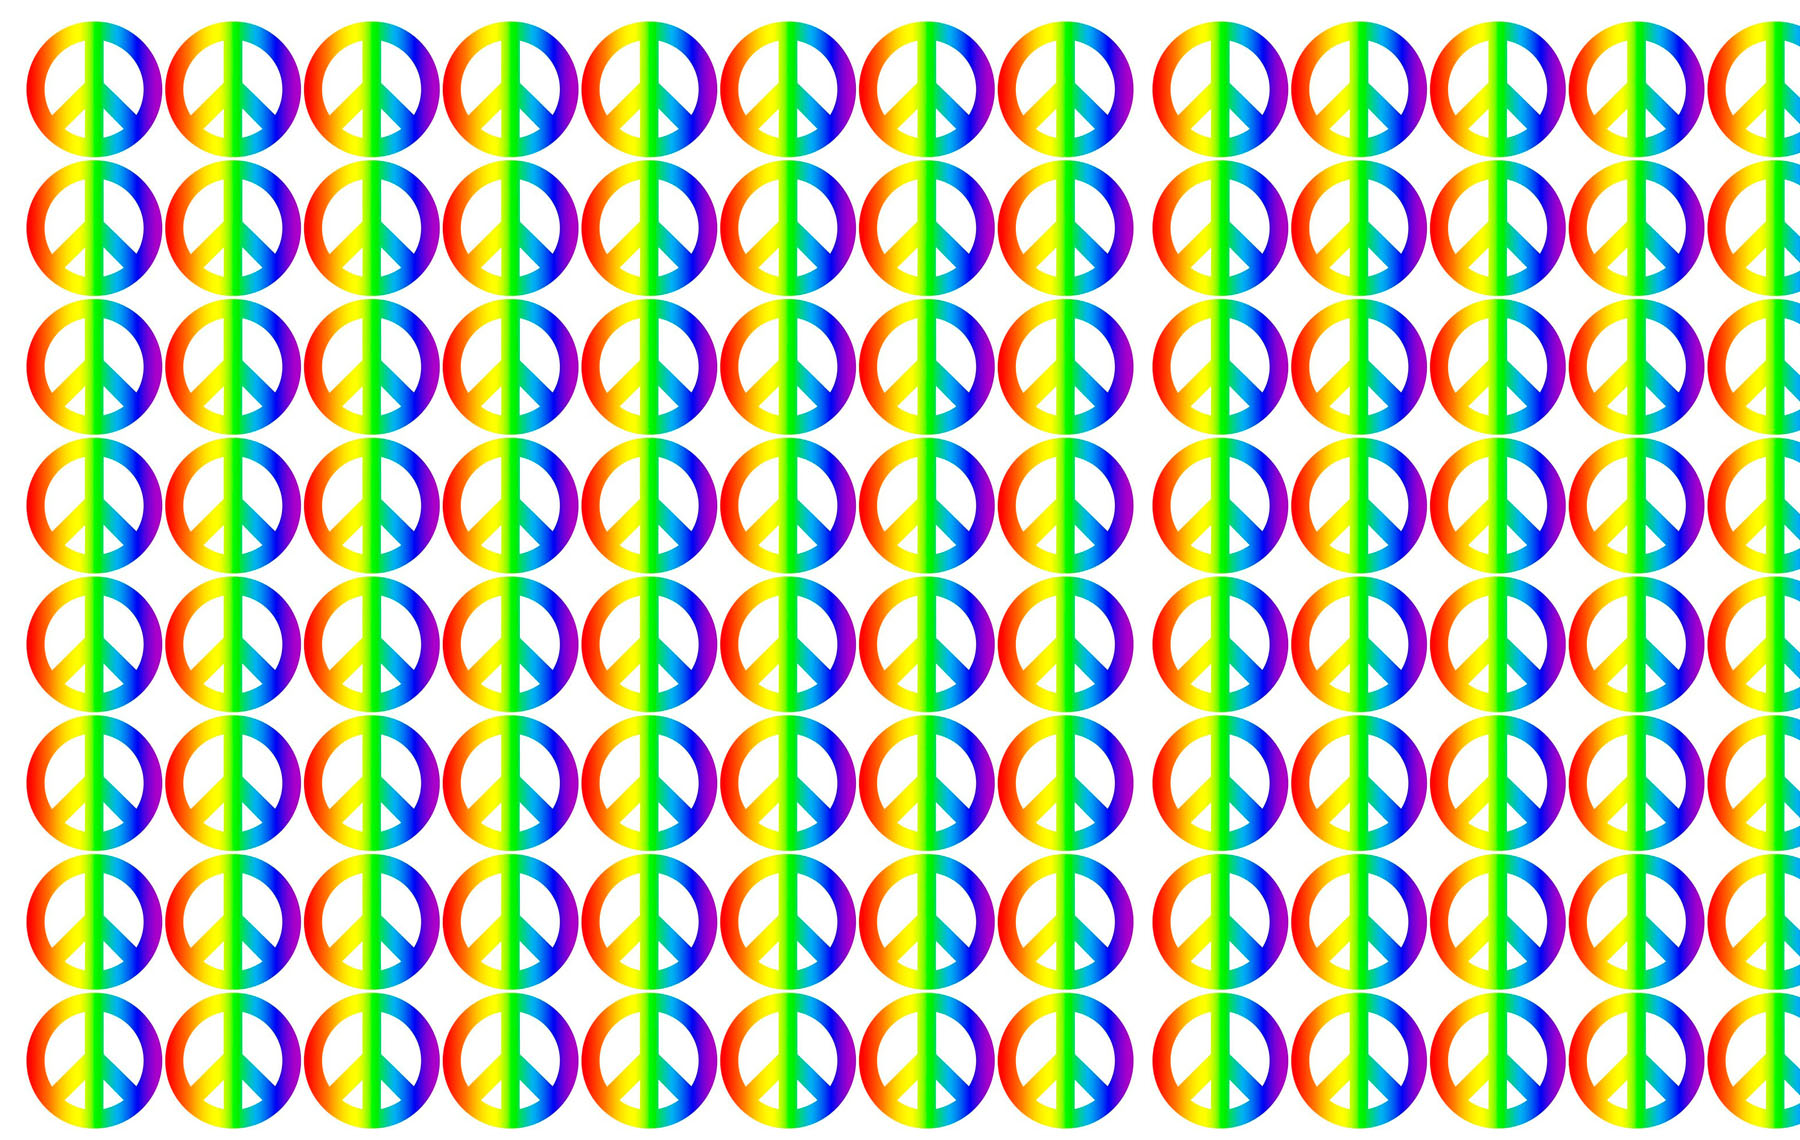 4-inch-template-1.jpg